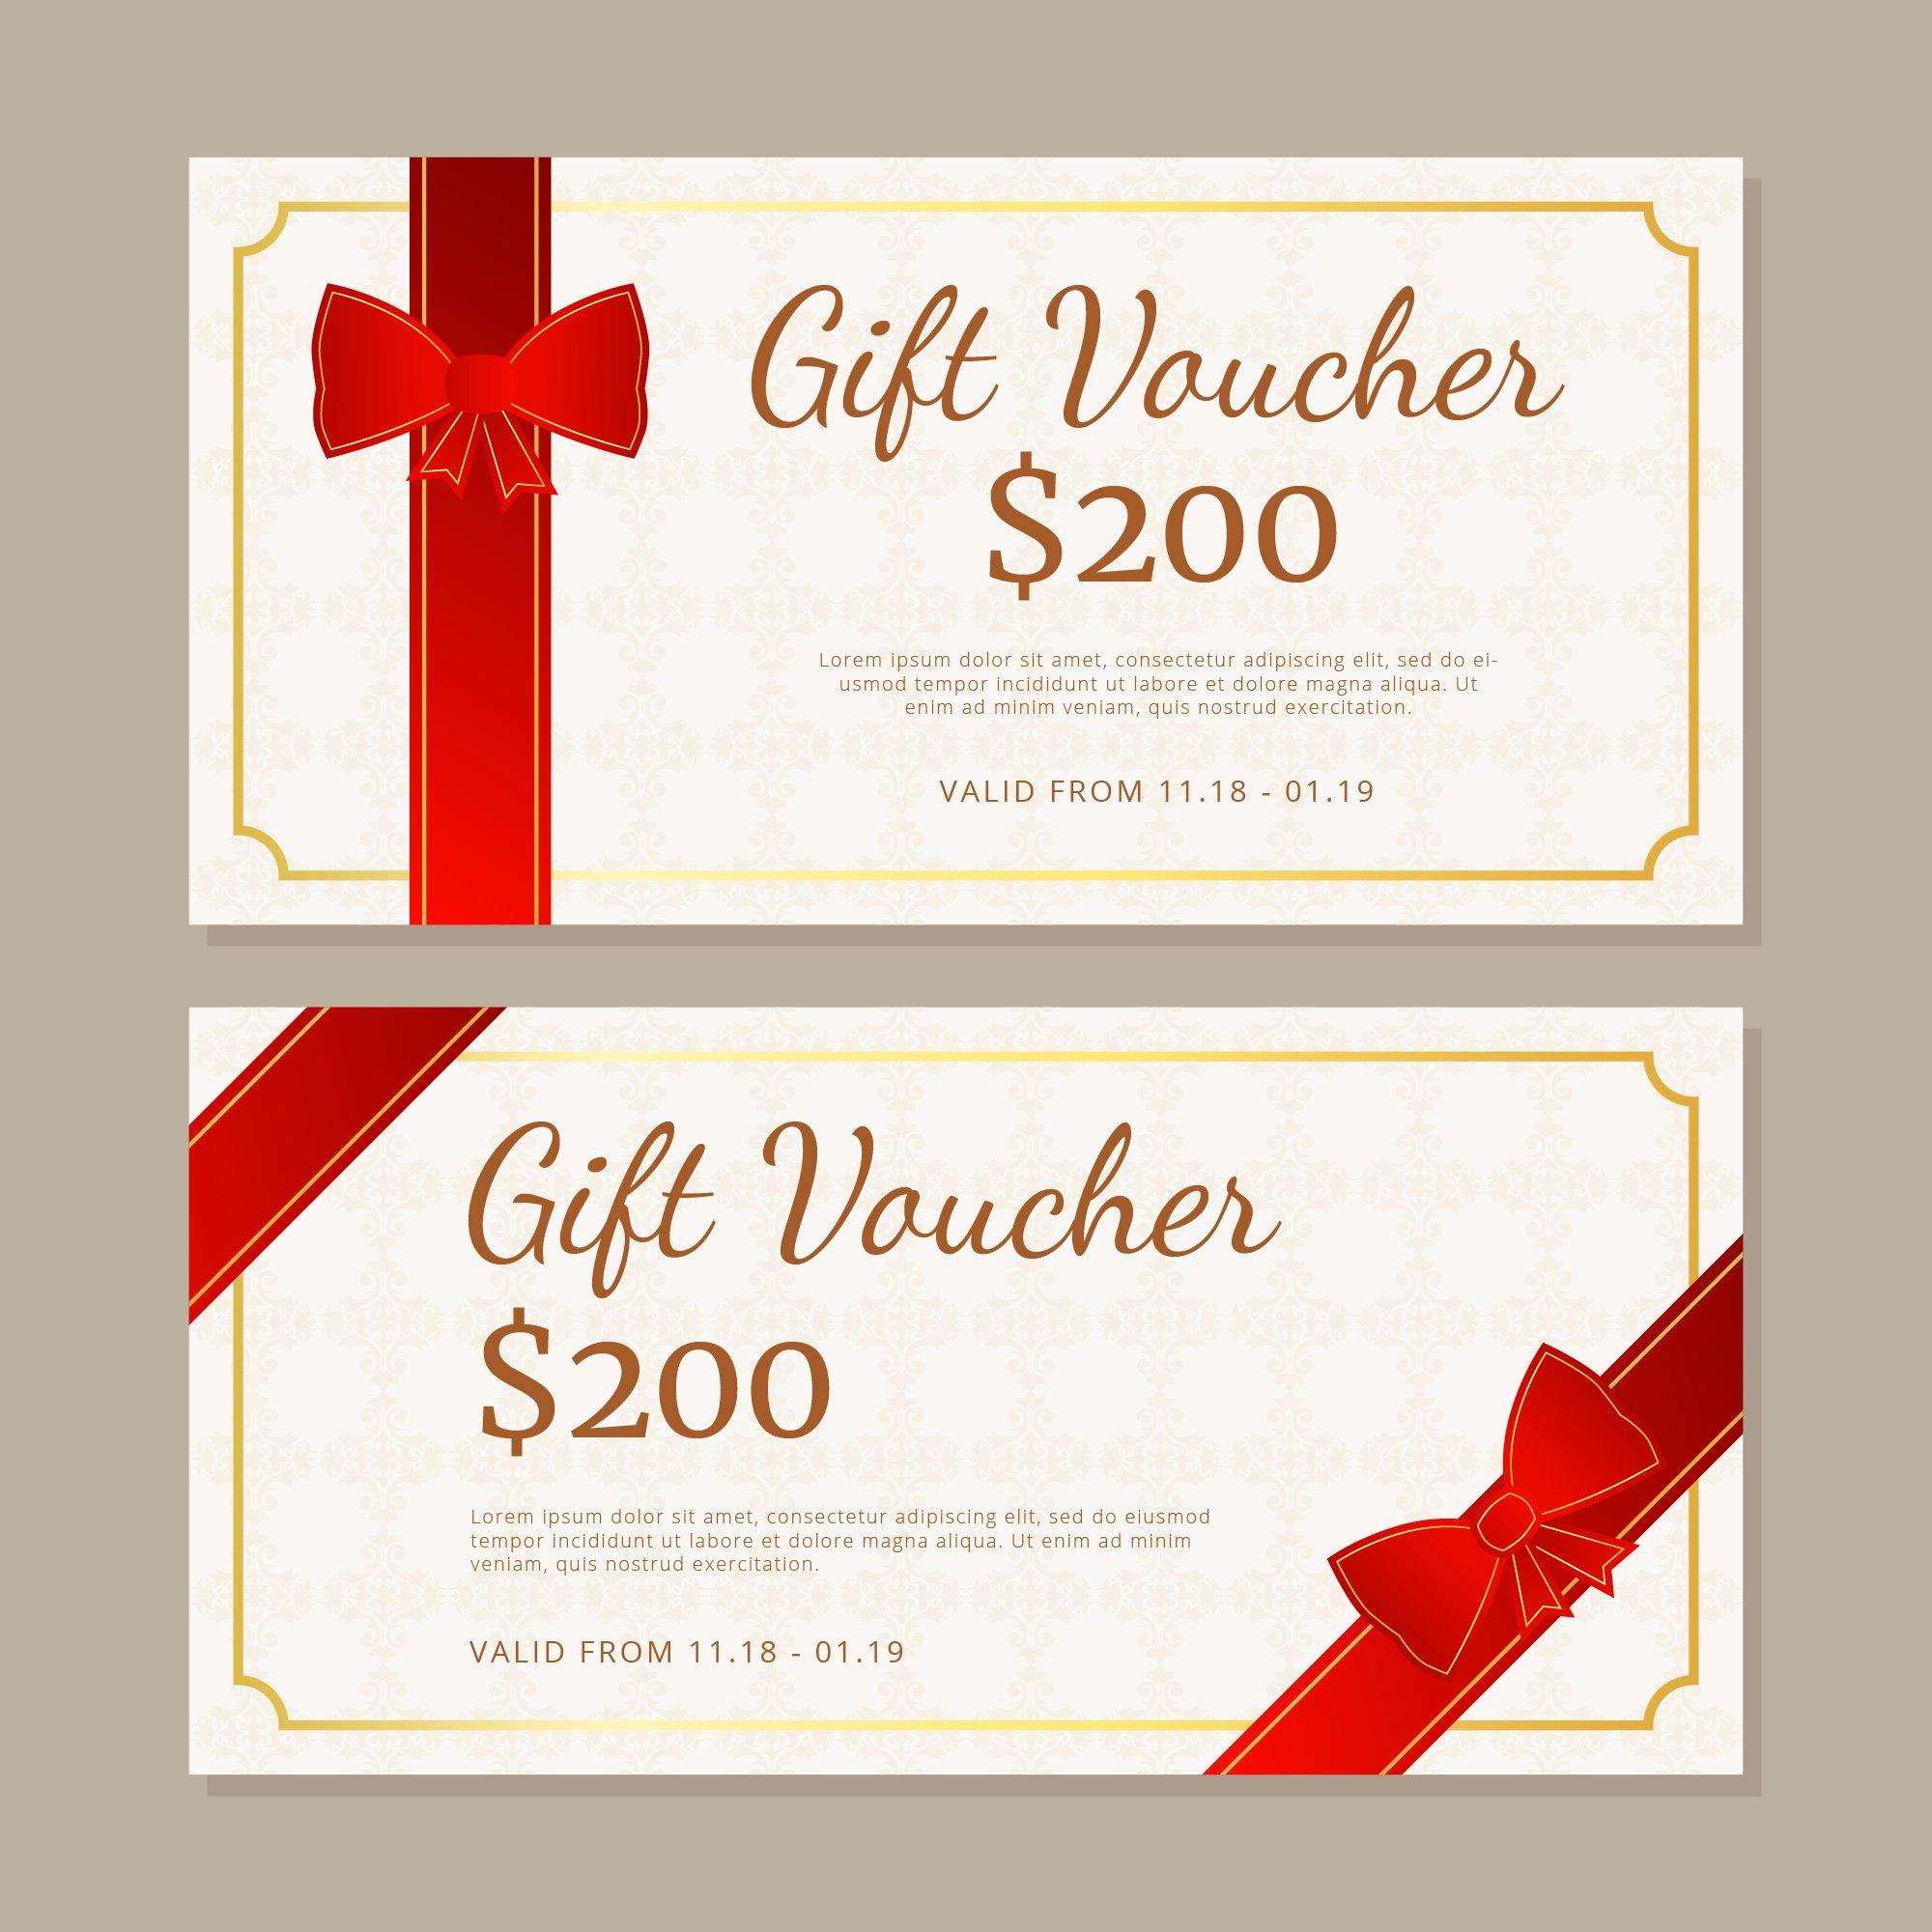 Gift Certificate Template Vector Inspirational Gift Certificate Free Vector Art 13 801 Free Downloads